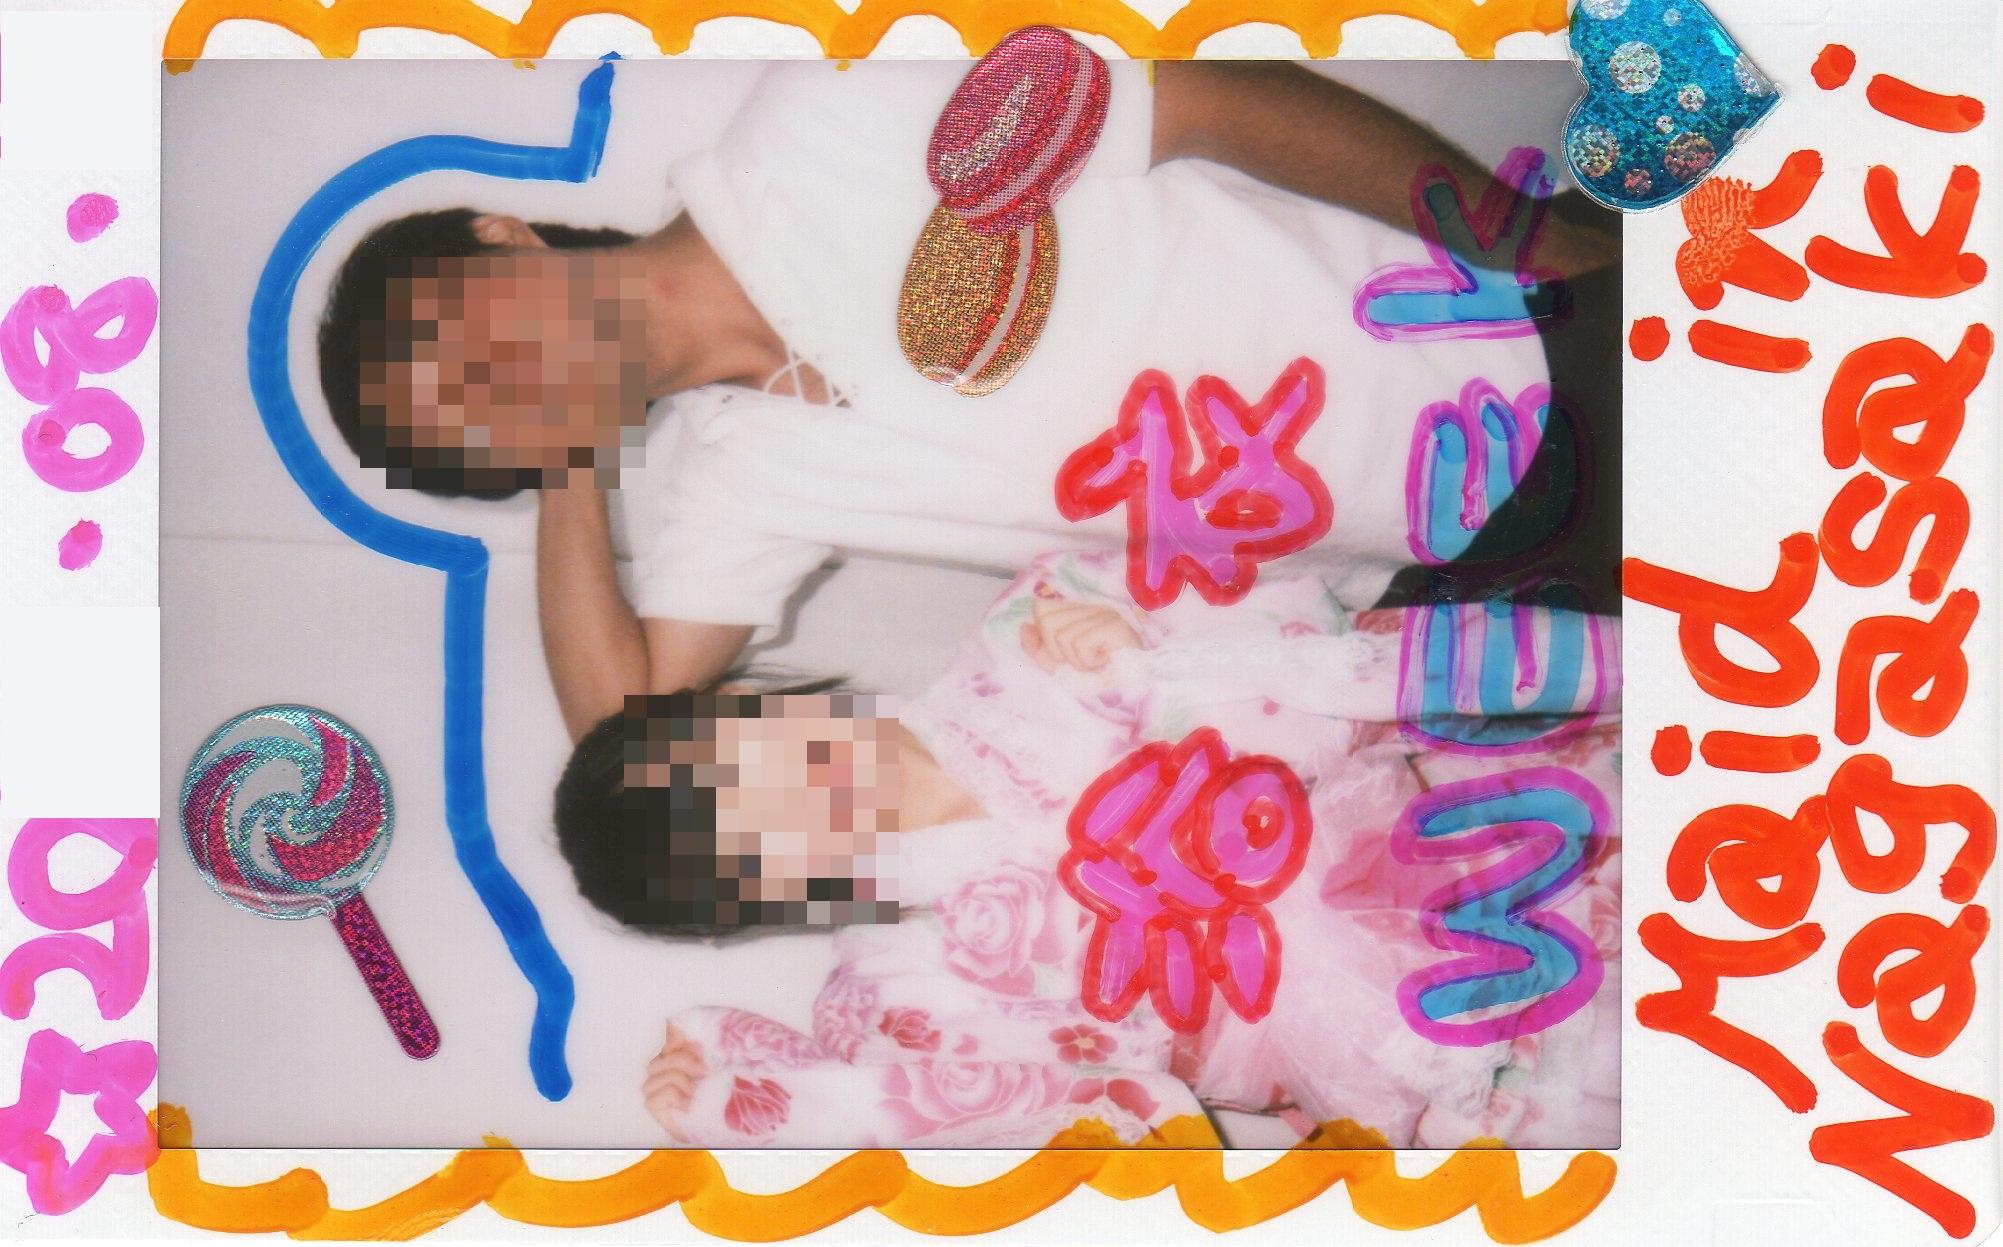 Maid in Nagasakiで浴衣でチェキ